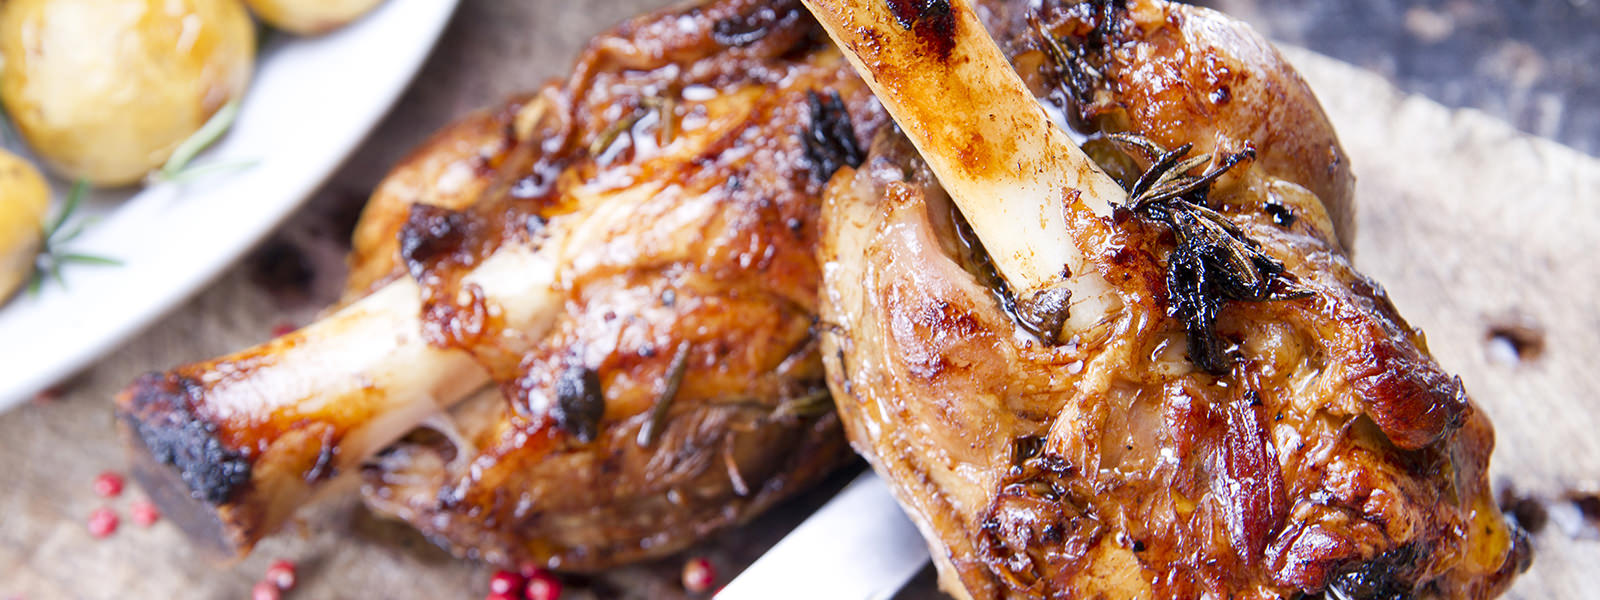 Cooking pork shank recipe | Food fox recipes